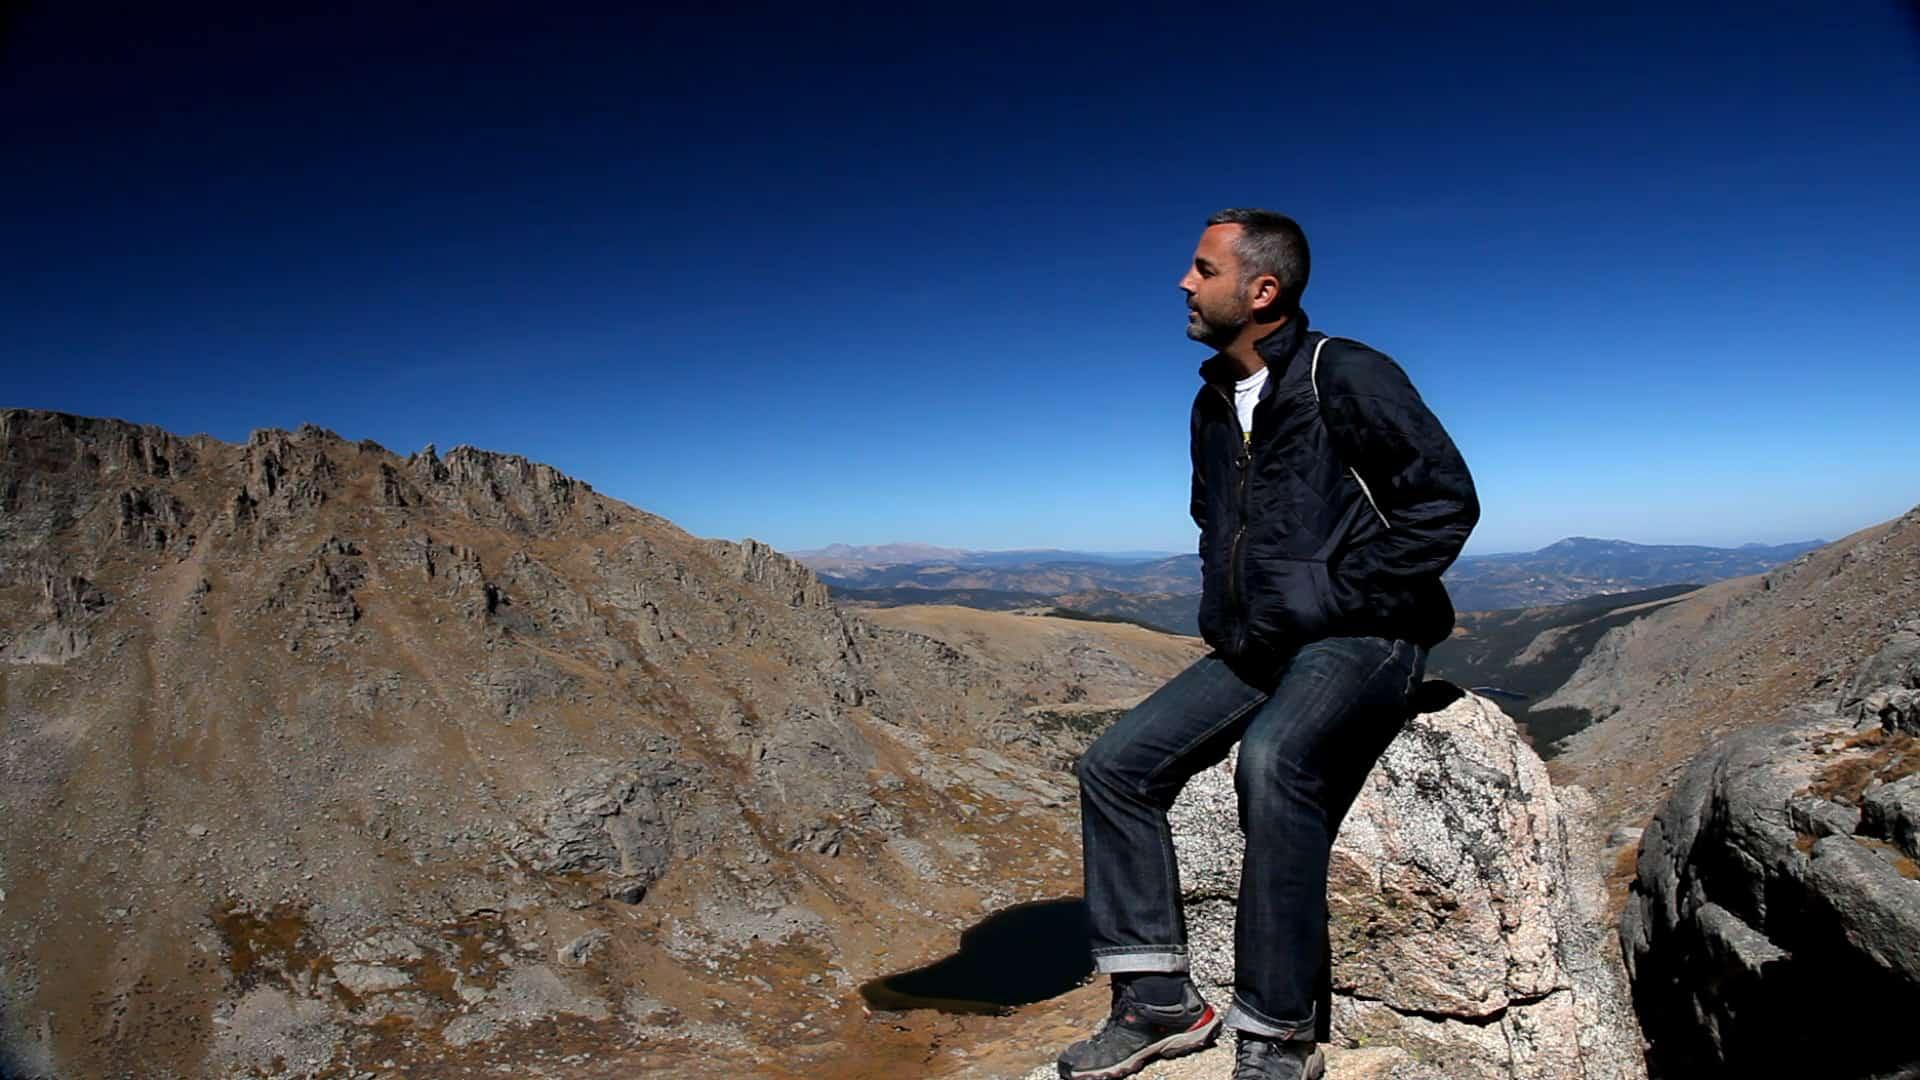 still of man at mountain top